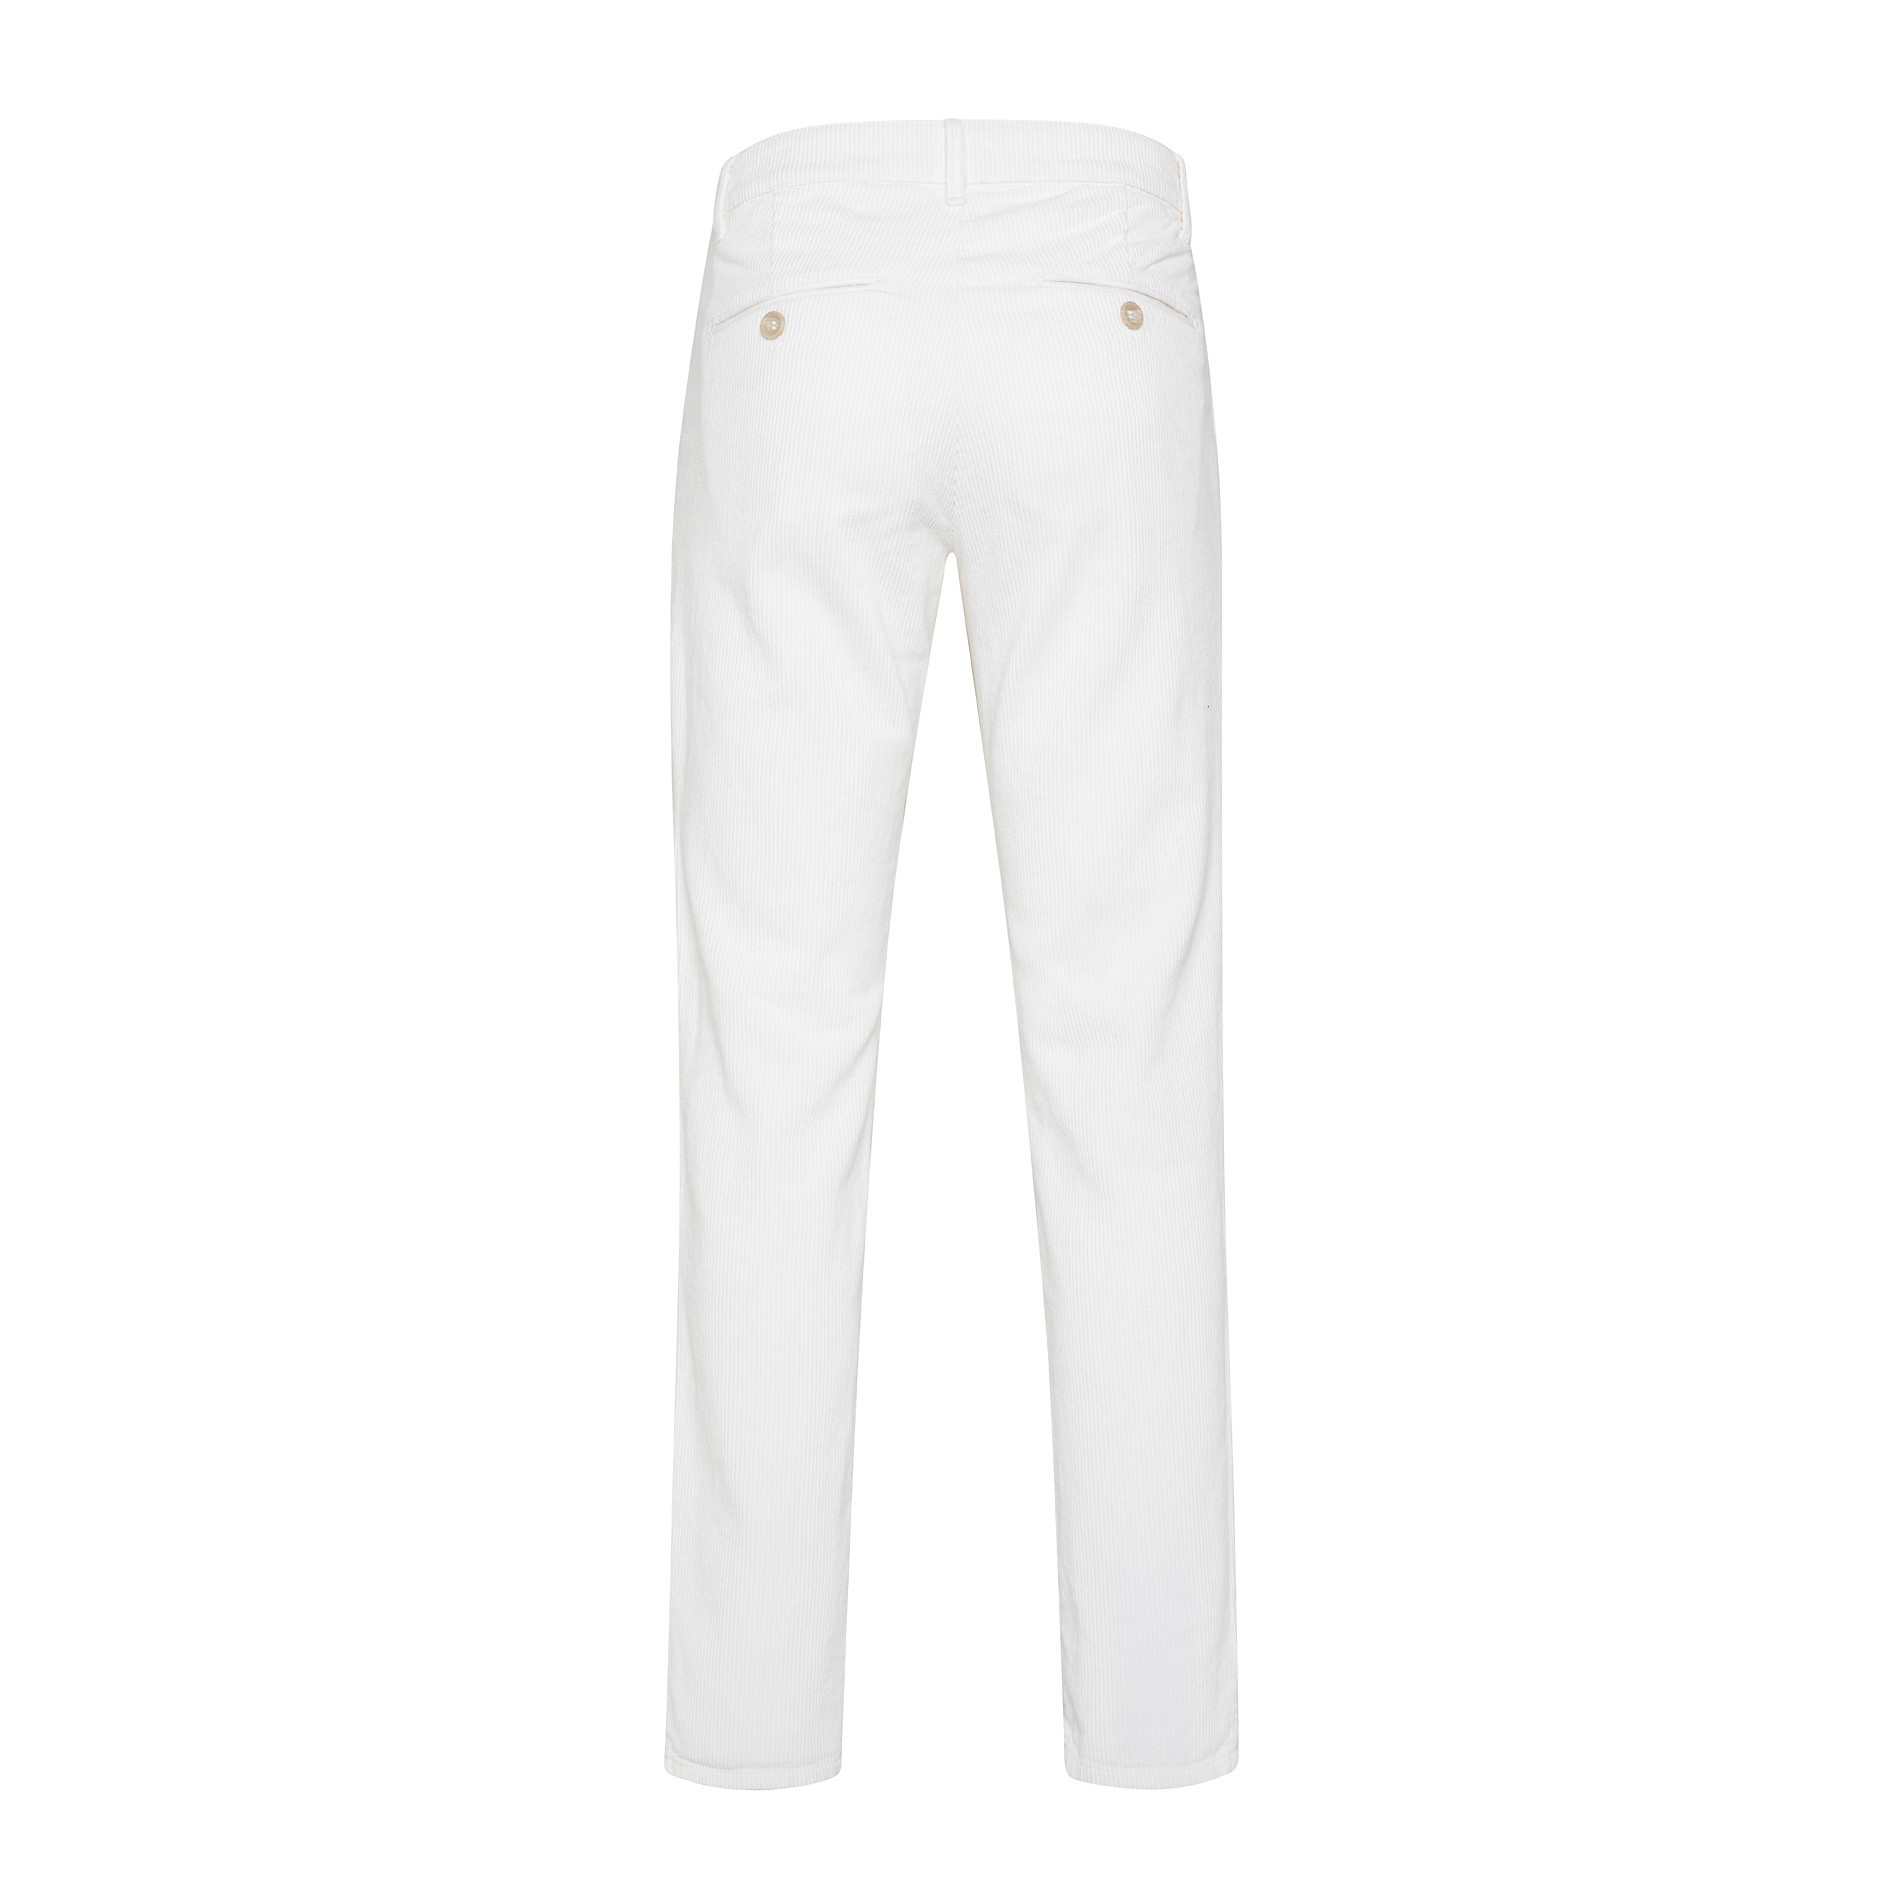 Pantaloni chino velluto stretch, Bianco, large image number 1